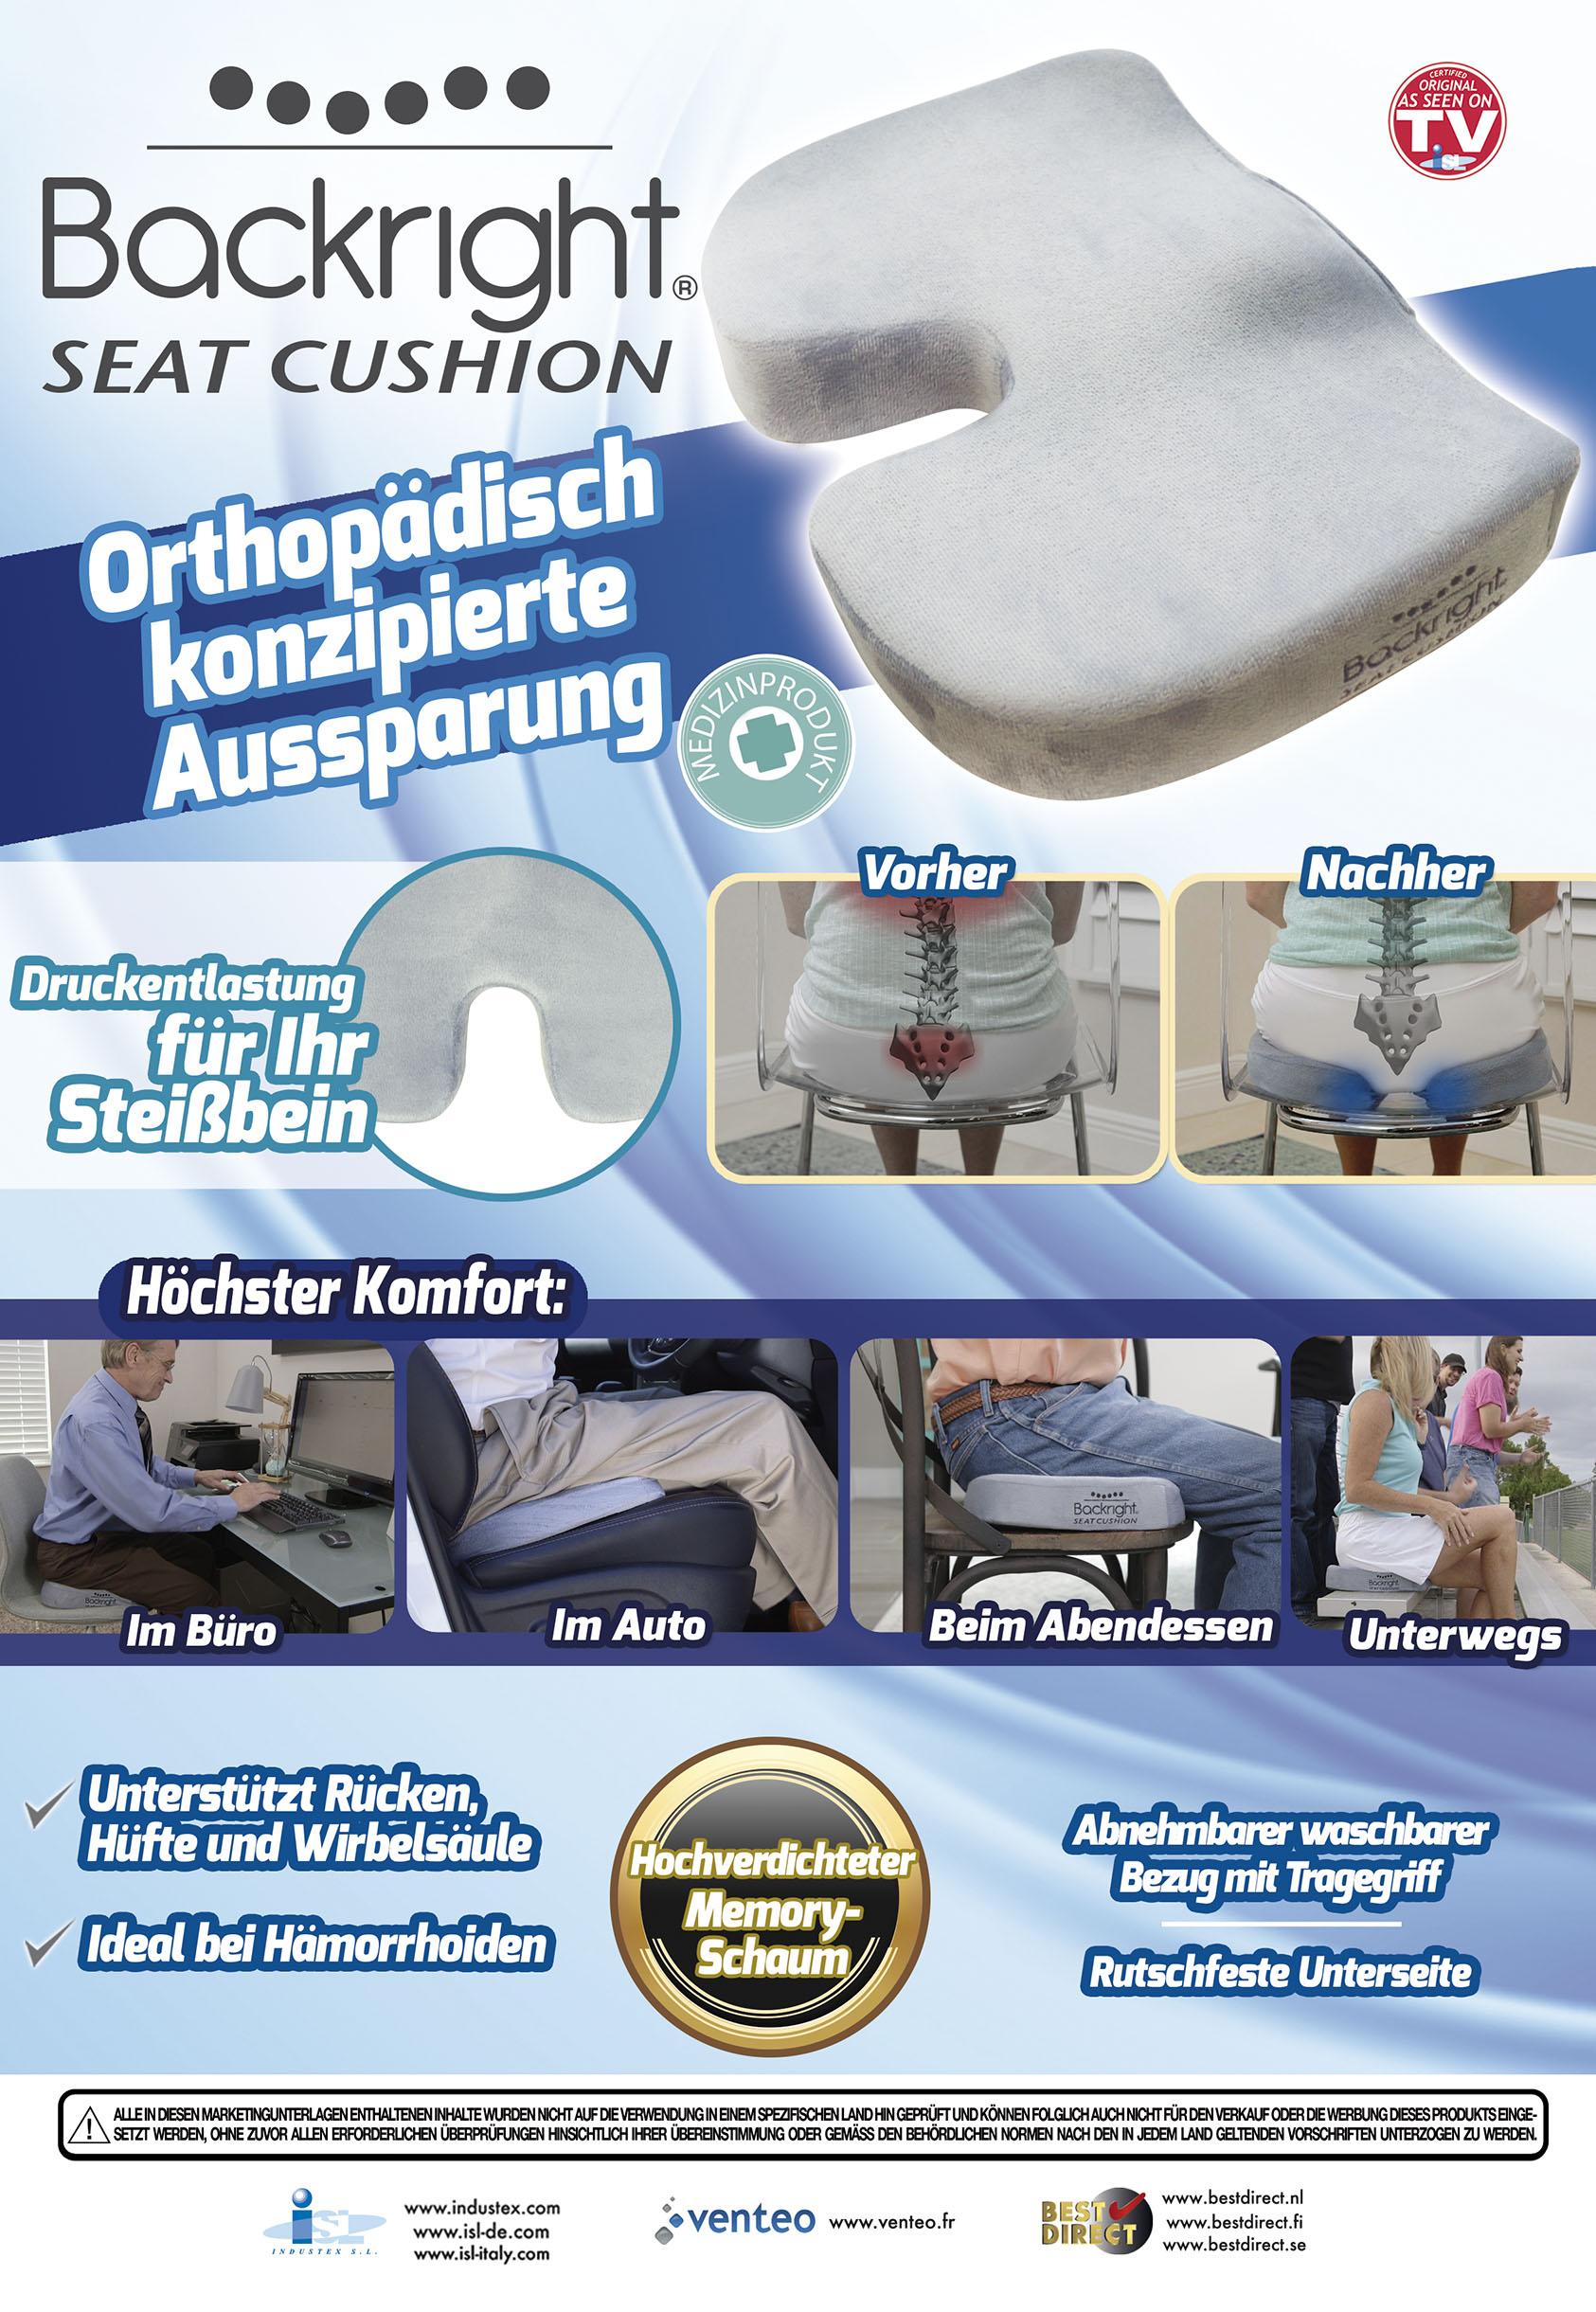 Original Backright Seat Cushion - orthopädisches Sitzkissen